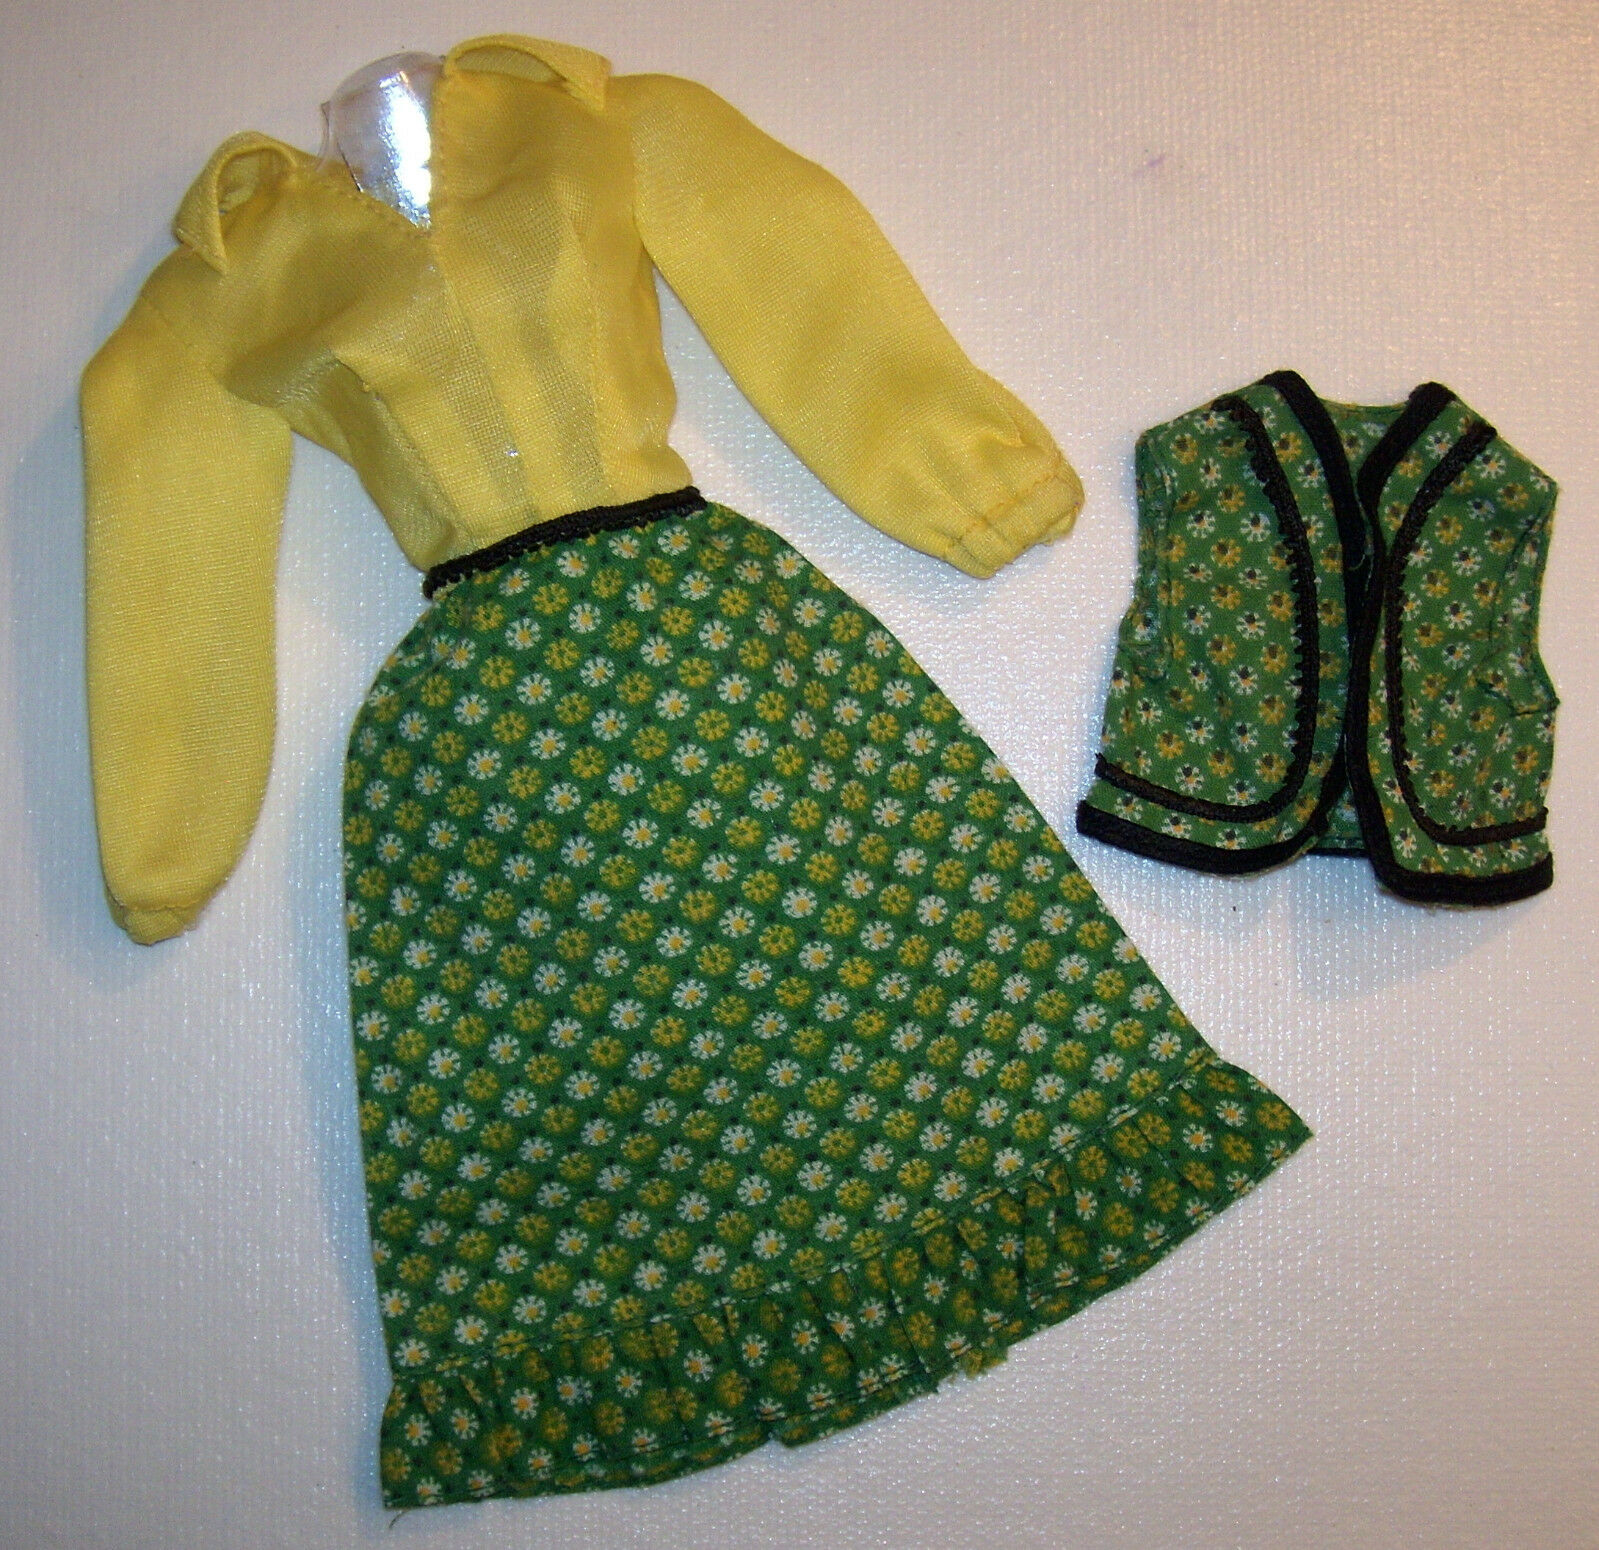 Vintage Barbie Best Buy Fashions  9627 Grün & Gelb Kleid & Weste 1977